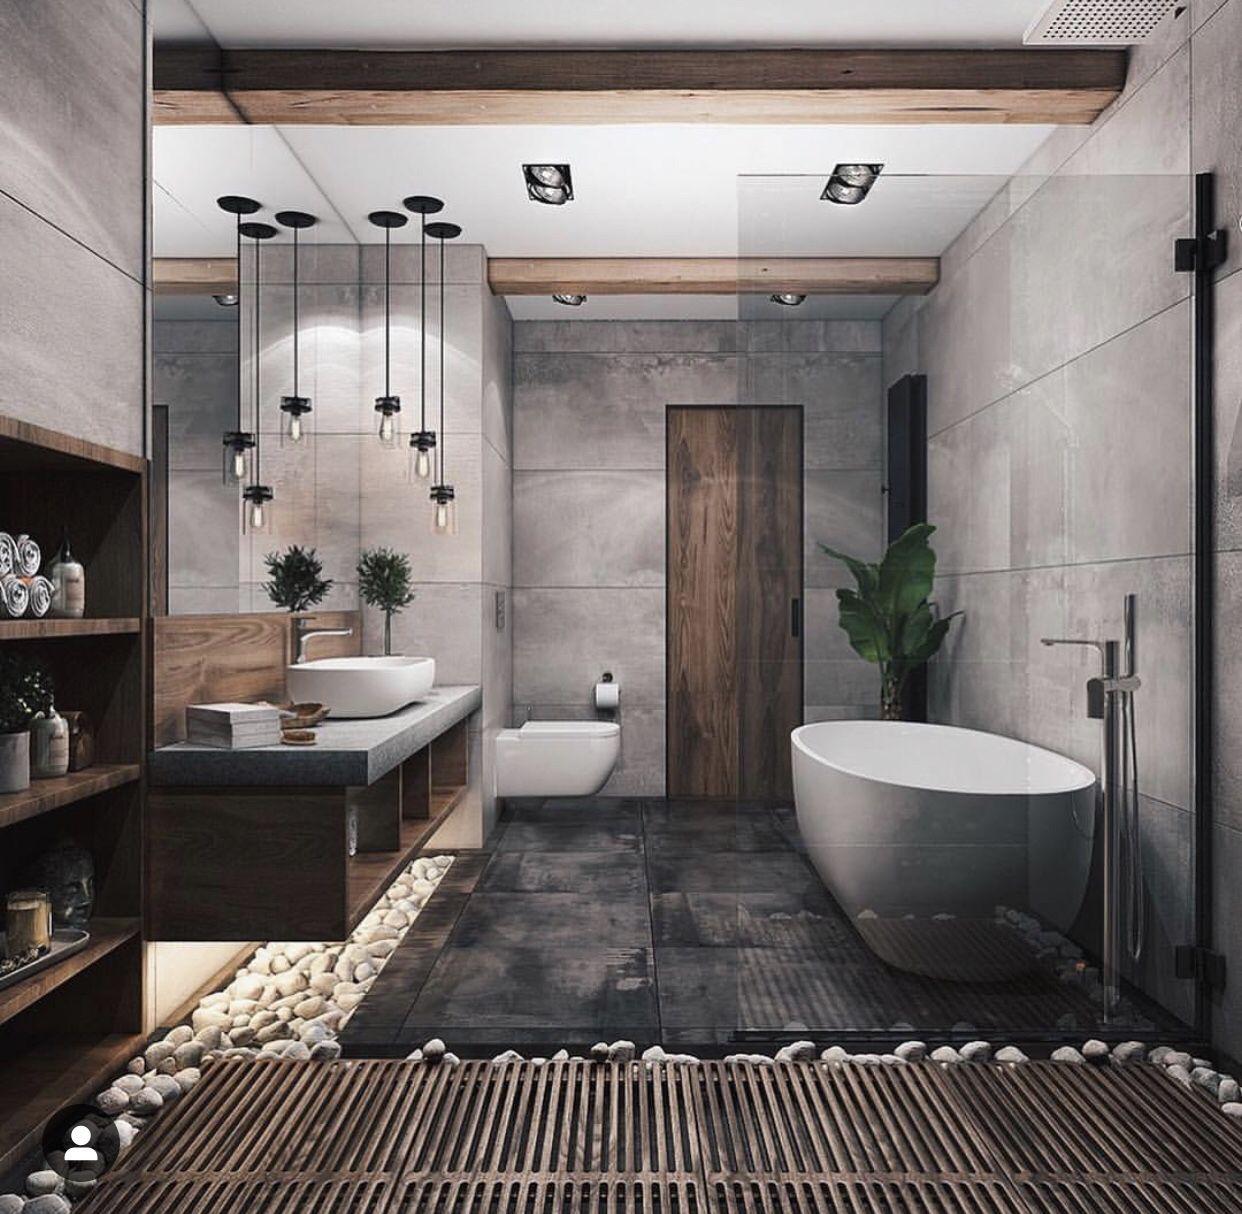 Pin By Radu Ciobanescu On Bathroom With Images Design Interior